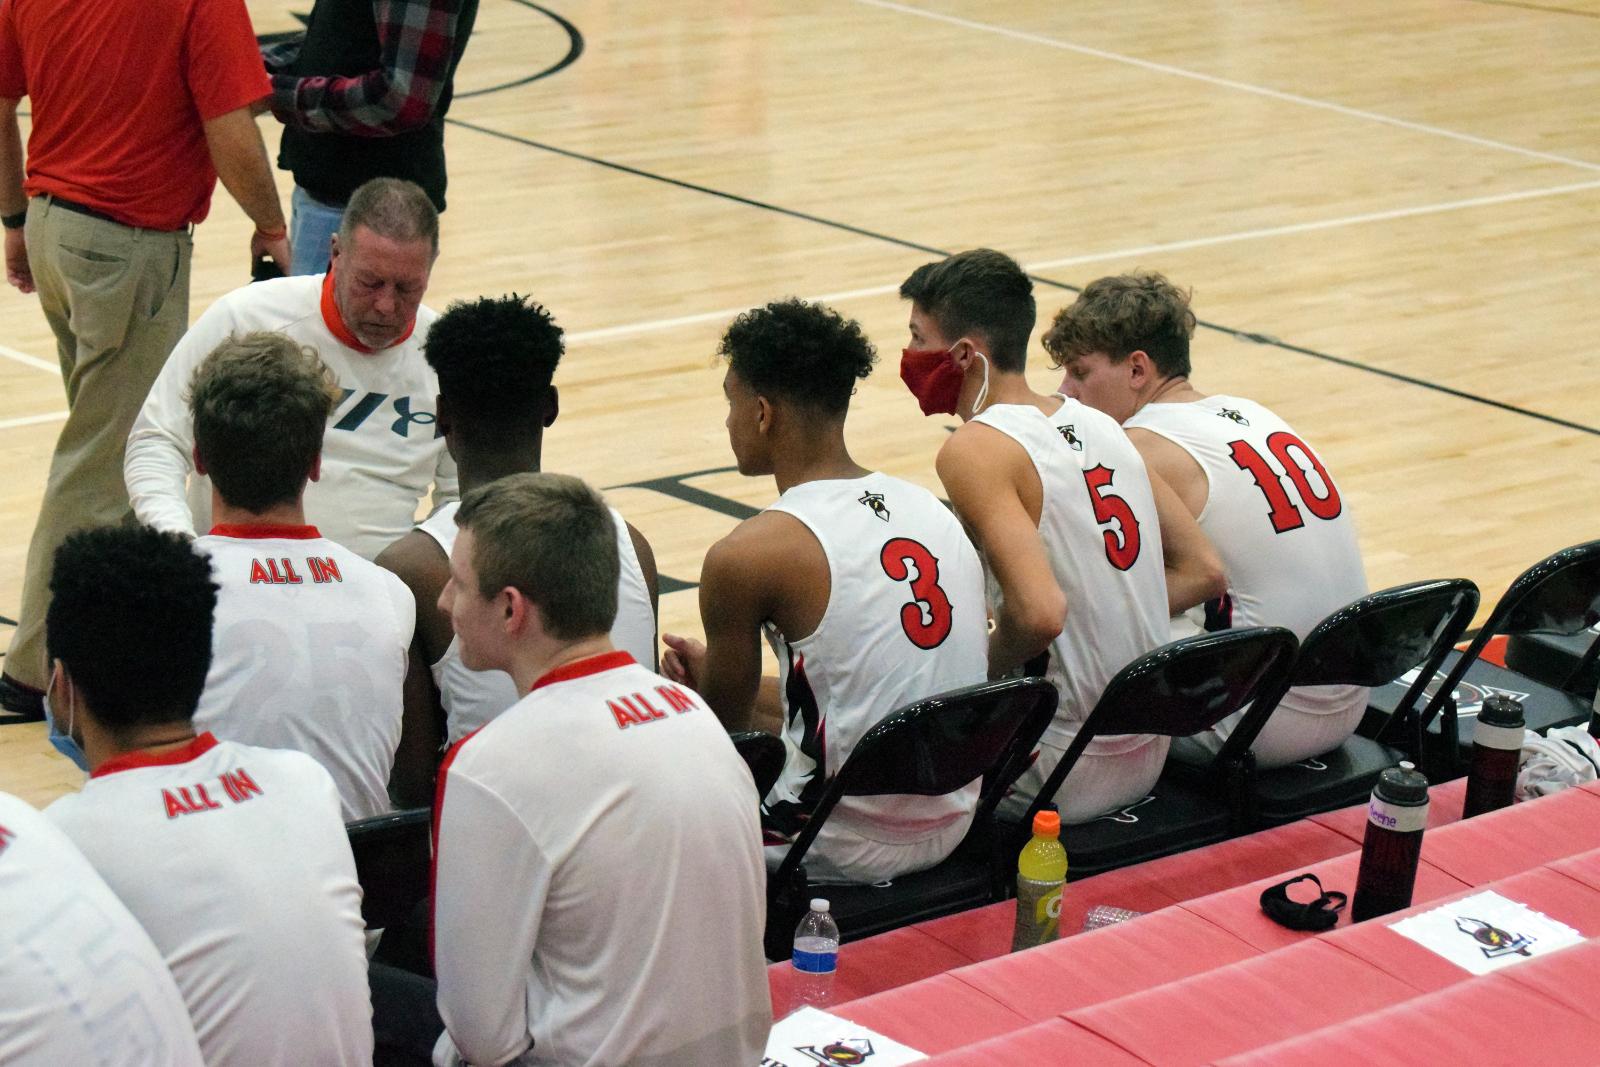 Taylor HS Boys Varsity Basketball vs Lewis Cass SENIOR NIGHT 12-11-20 (Lost 37-52)